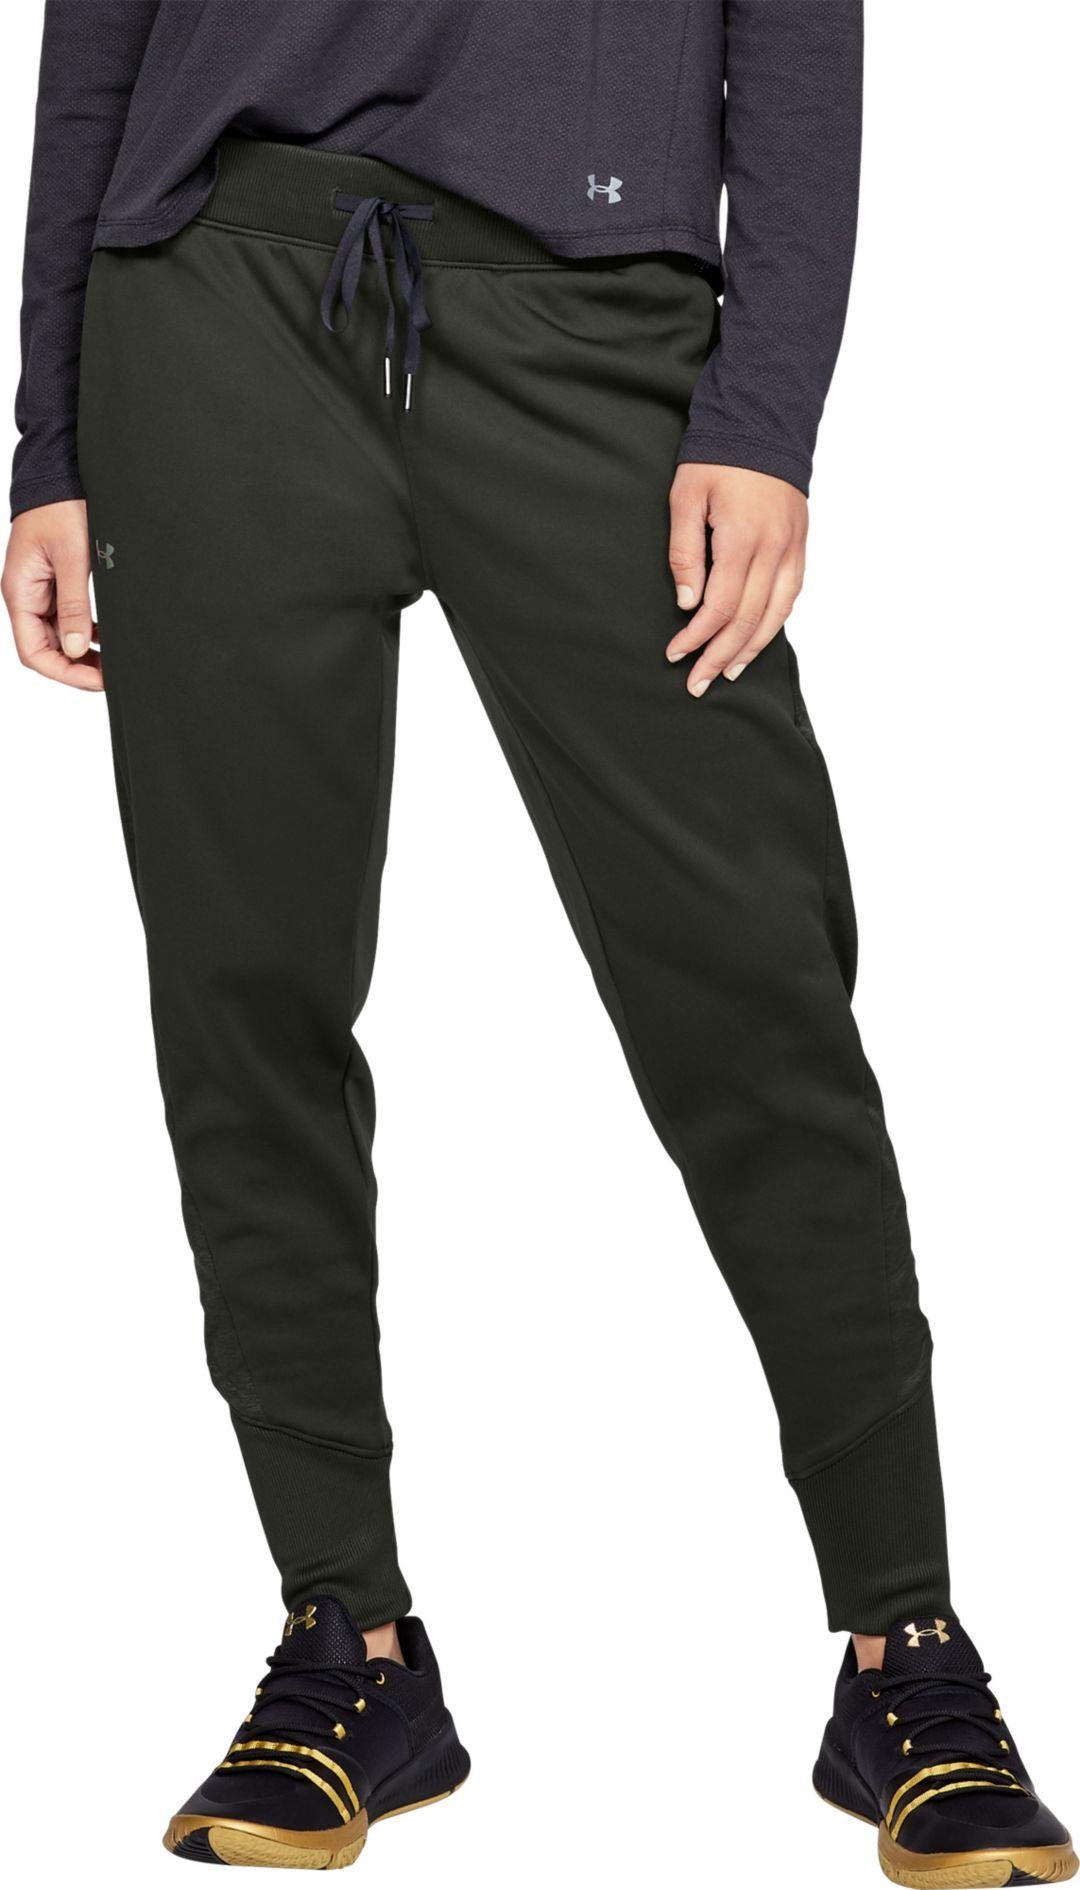 e38056dc9d03e Under Armour Women's Armour Fleece Jogger Pants | DICK'S Sporting Goods